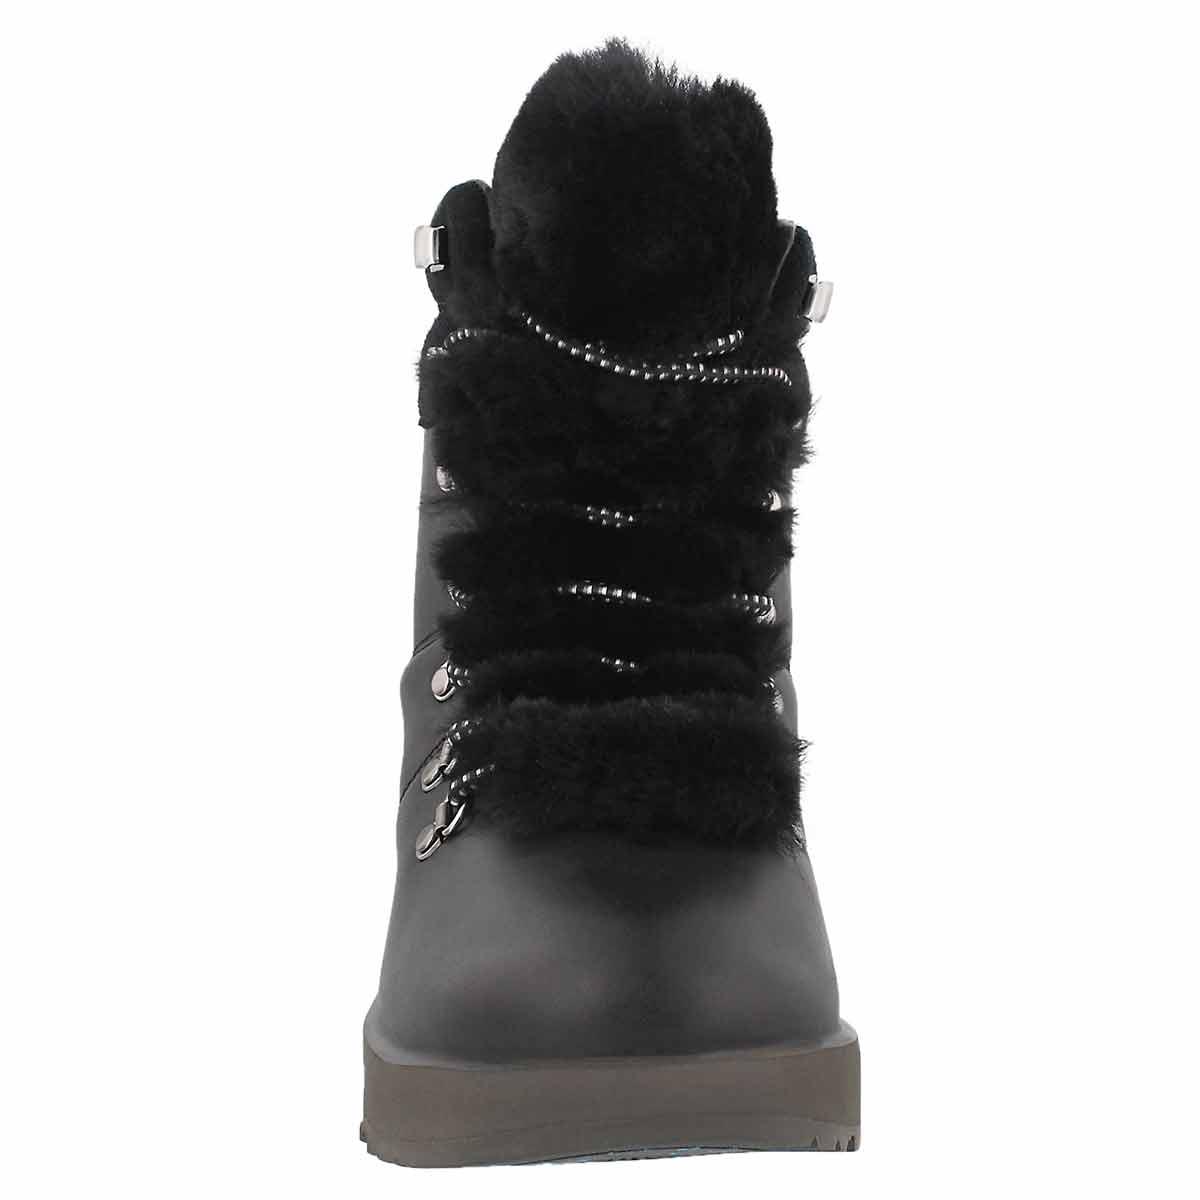 c996f7ea21d Women's VIKI black waterproof laceup ankle boots